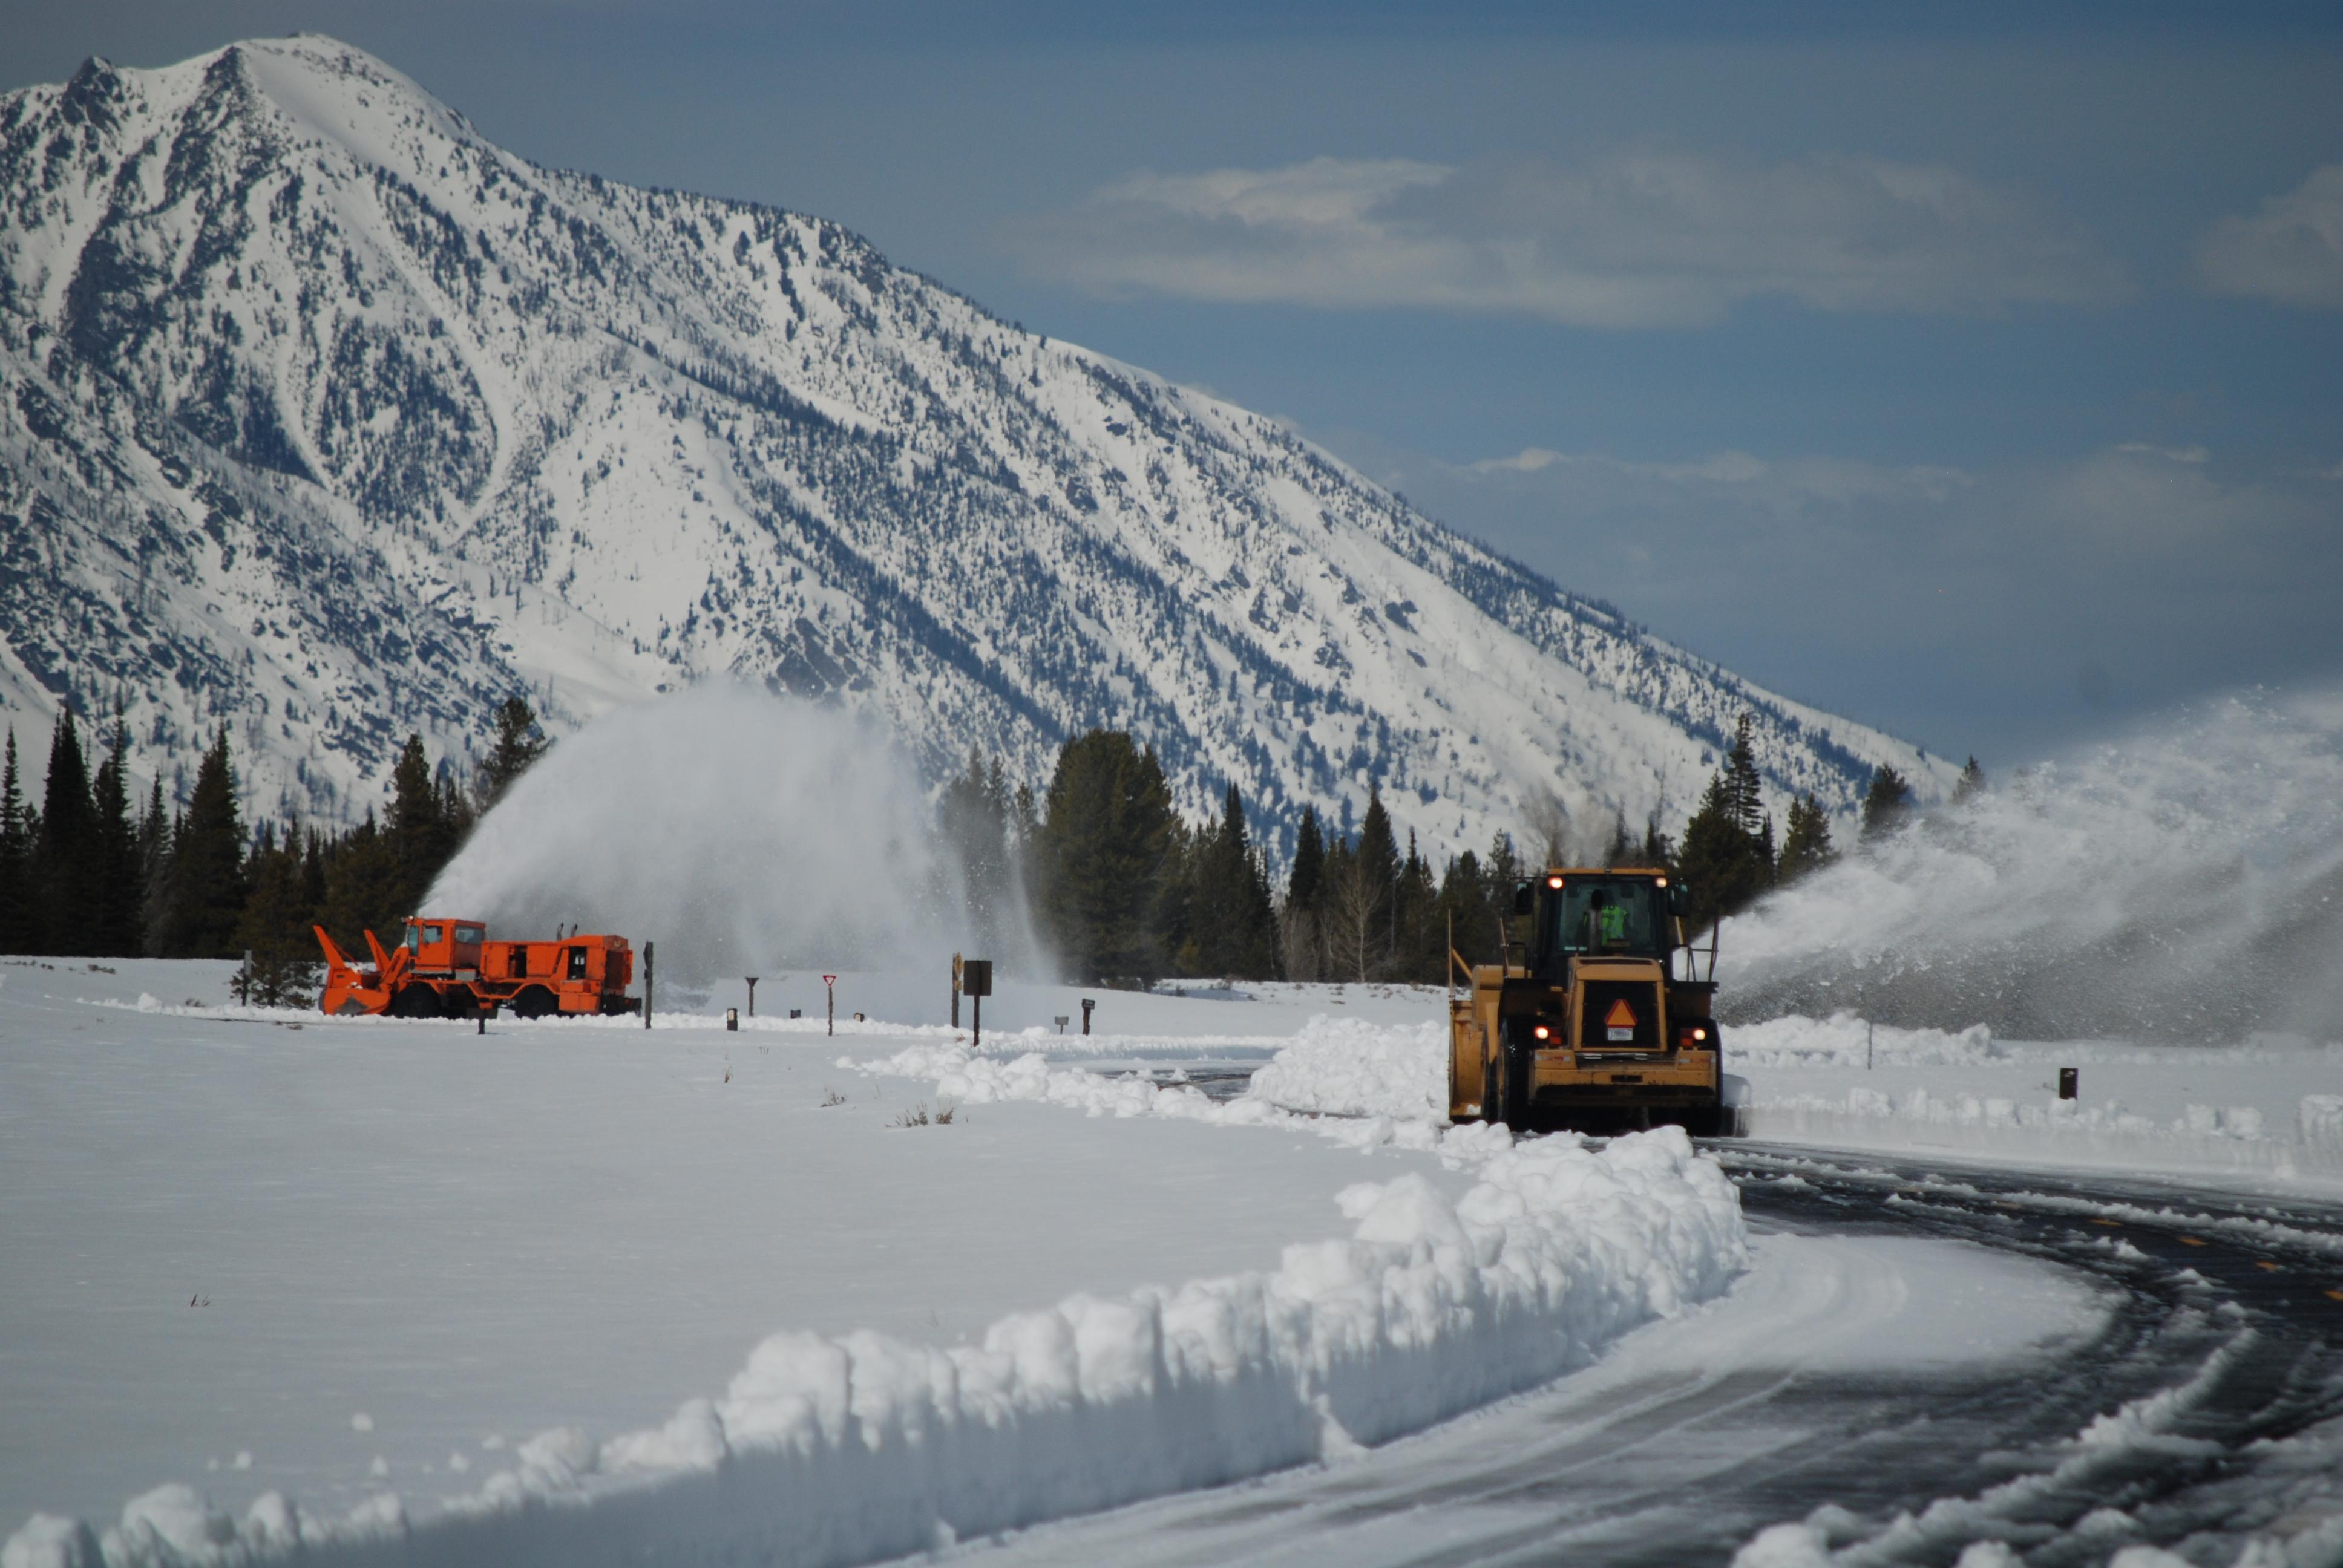 GTNP Spring Plowing begins on Monday